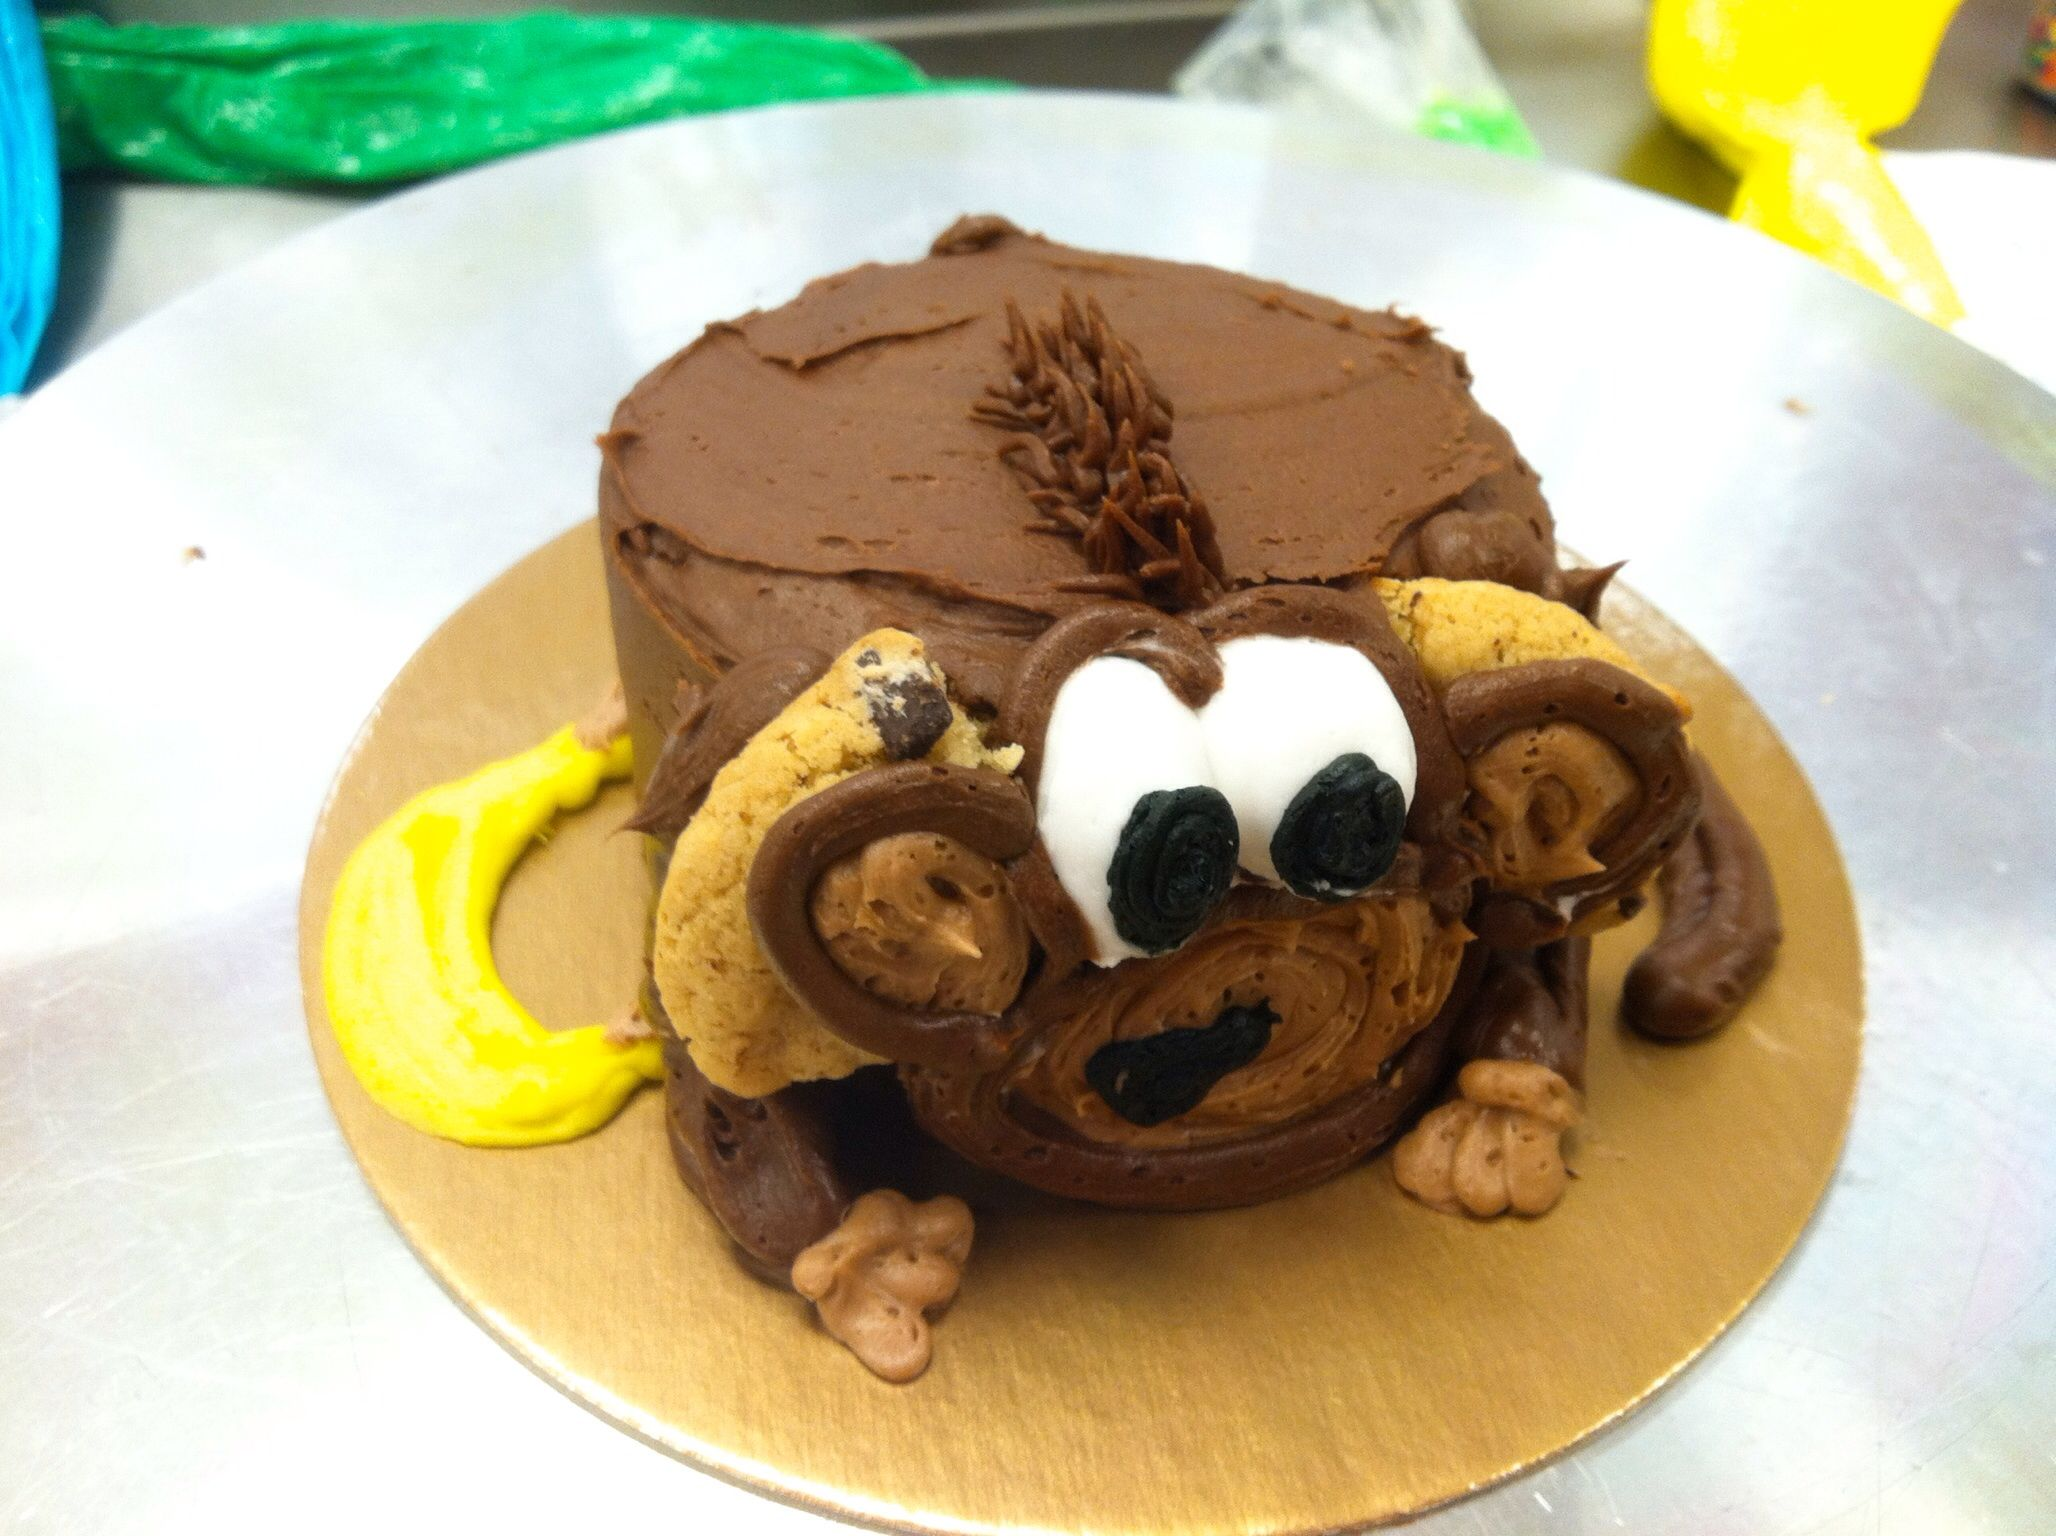 Monkey smash cake Email me for cakes!  Belongstomord@gmail.com Frisco tx